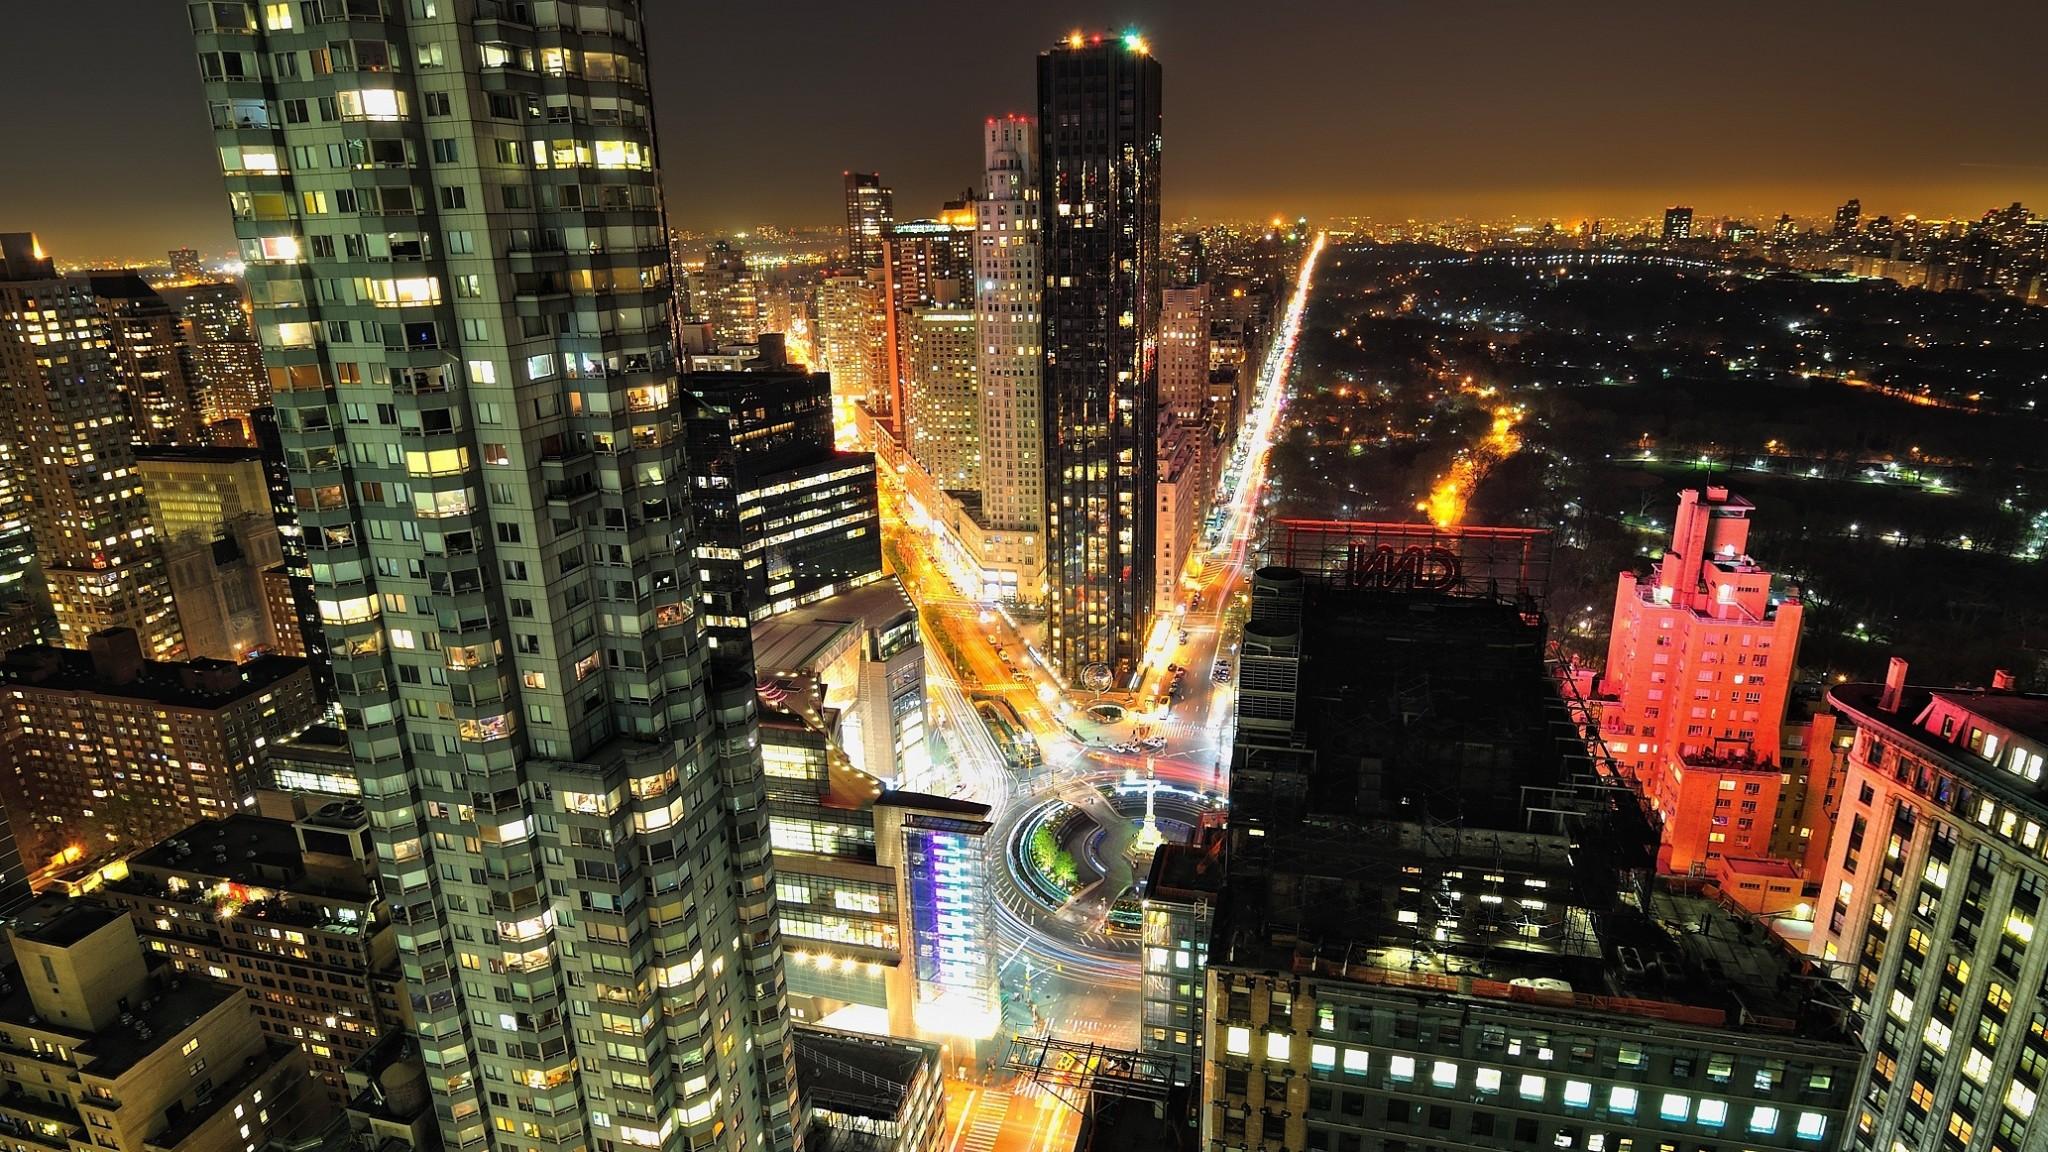 manhattan  central park  new york  night  skyscrapers  street  usa HD Wallpaper